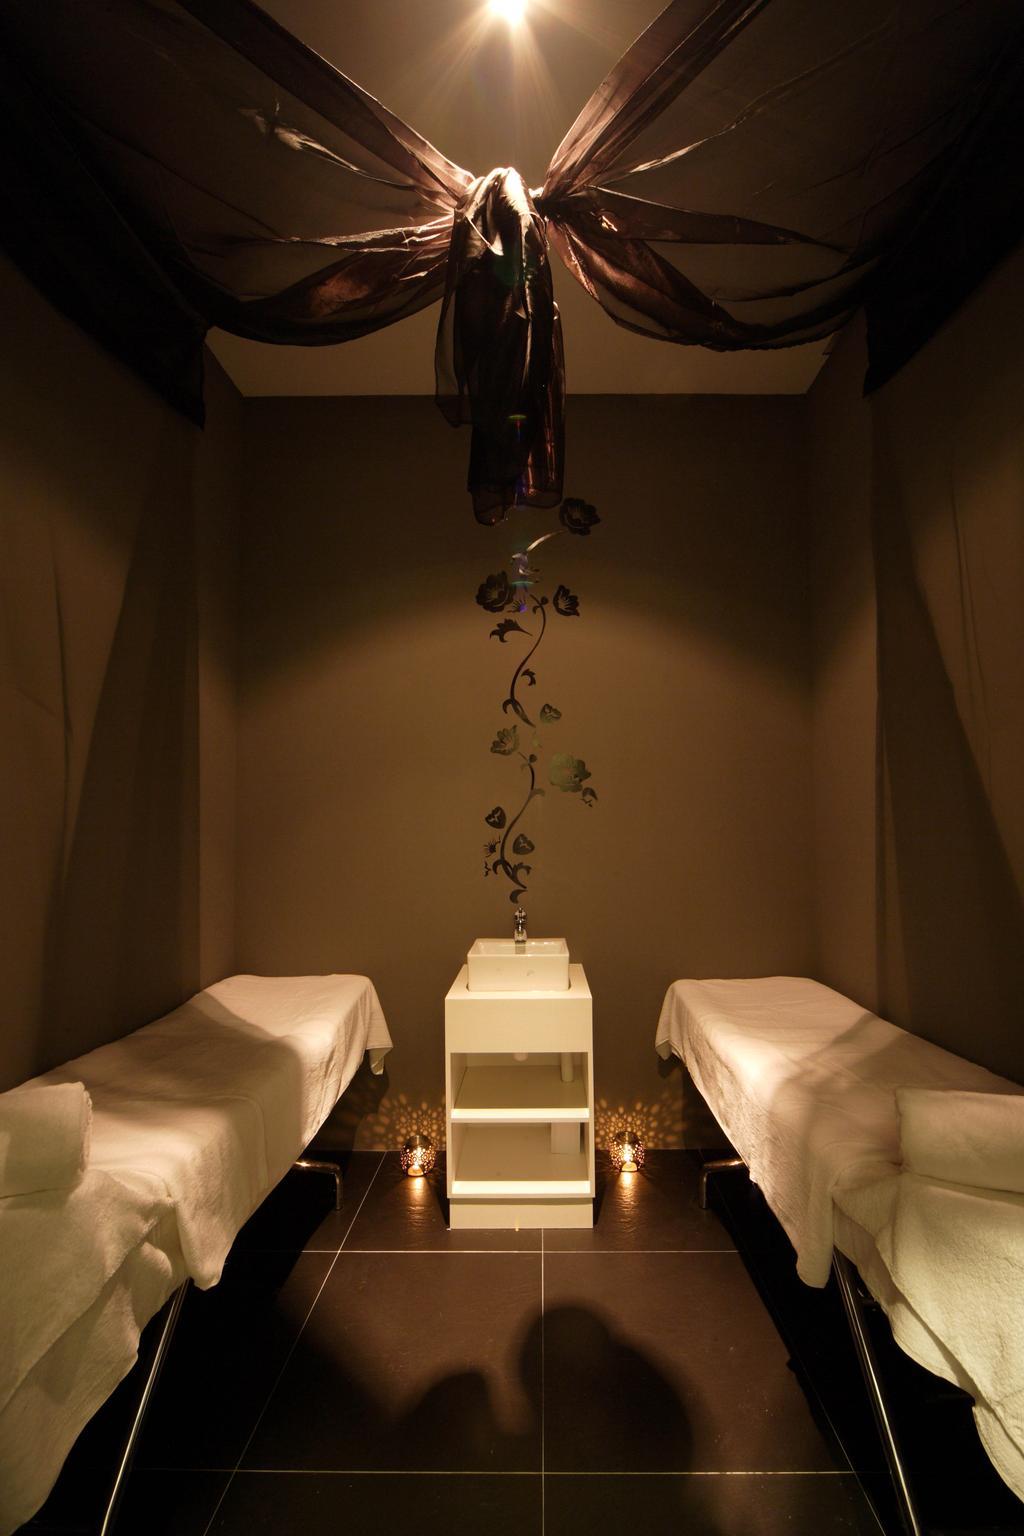 Pure Solution, Commercial, Interior Designer, De Exclusive Design Group, Traditional, Dim, Dim Lighting, Bed, Sink